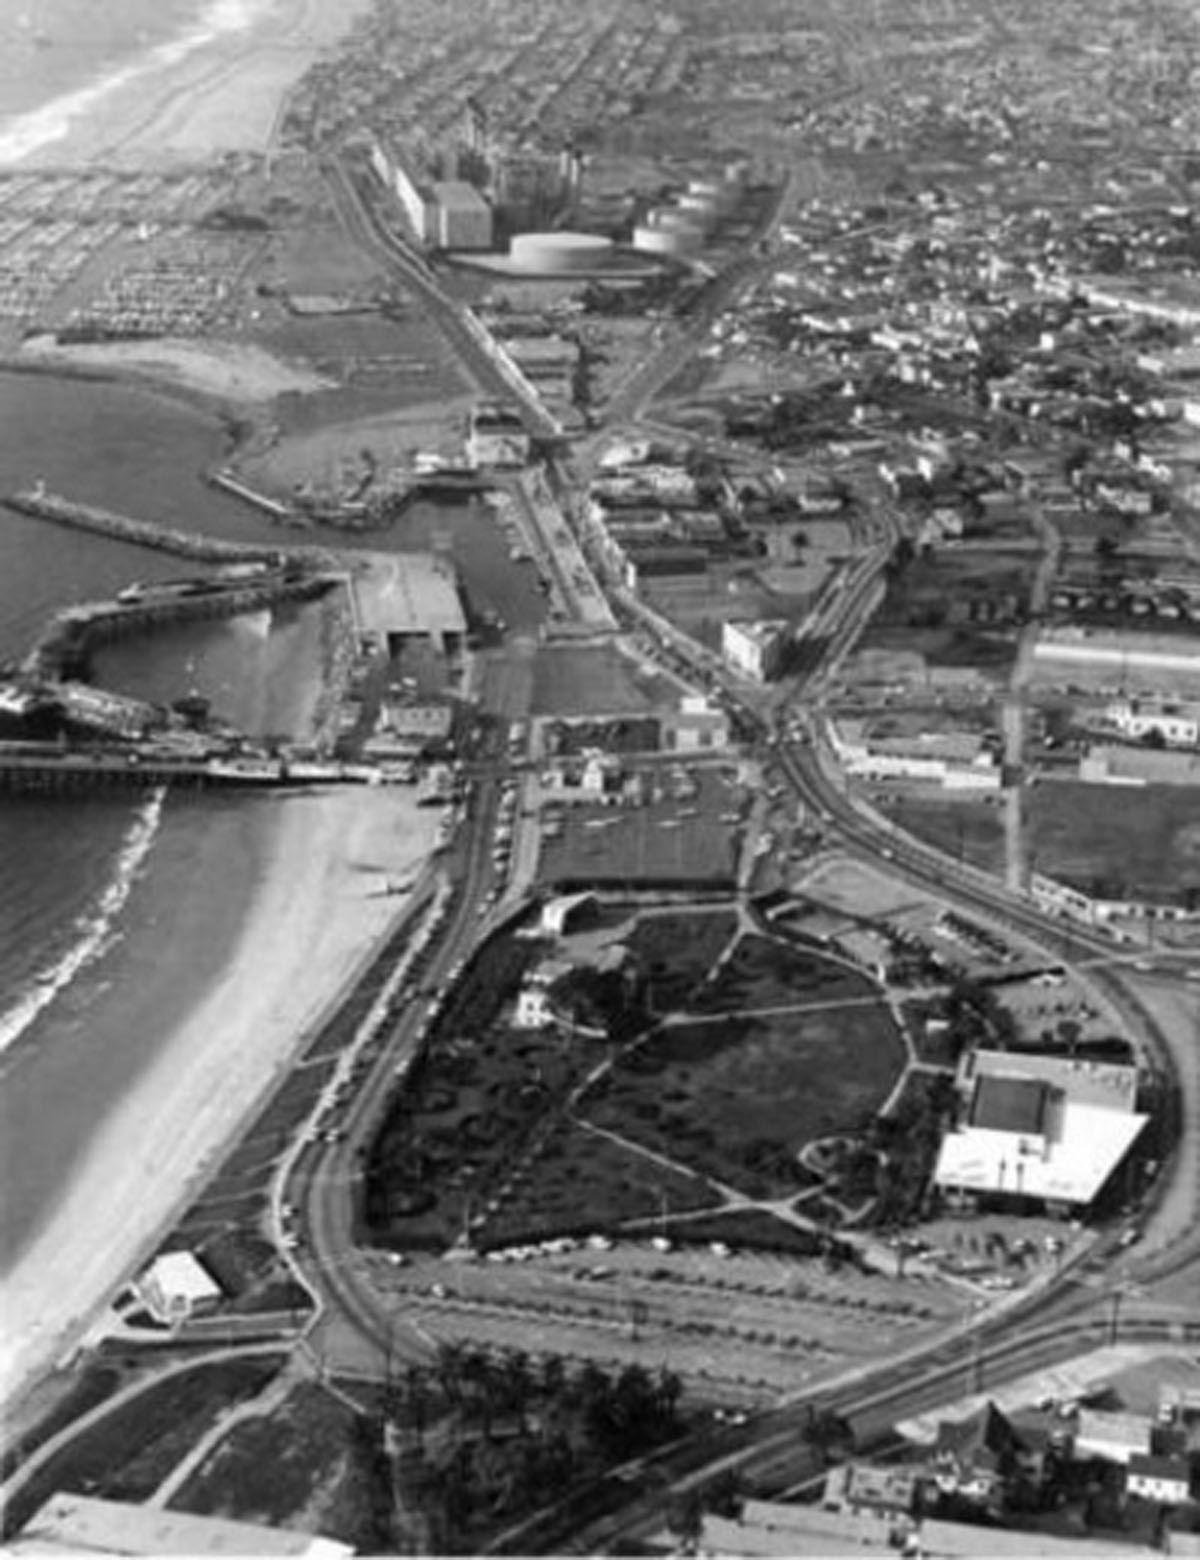 1969 Redondo Beach aerial the year I